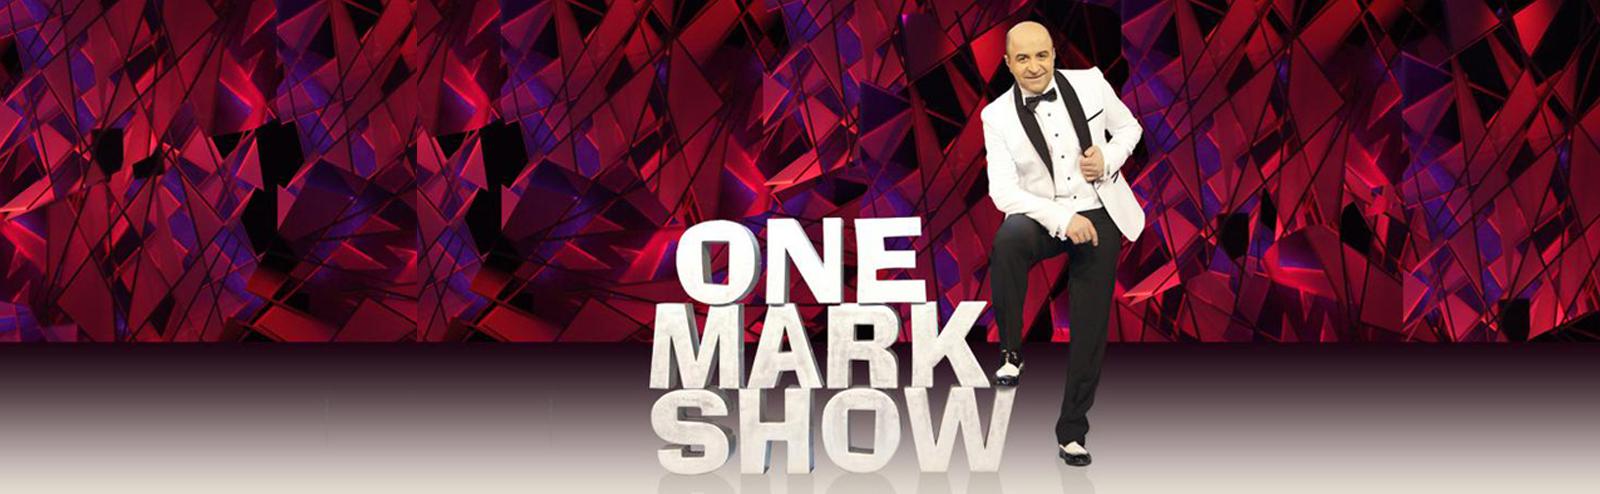 frontPageRotator-OneMarkShow1